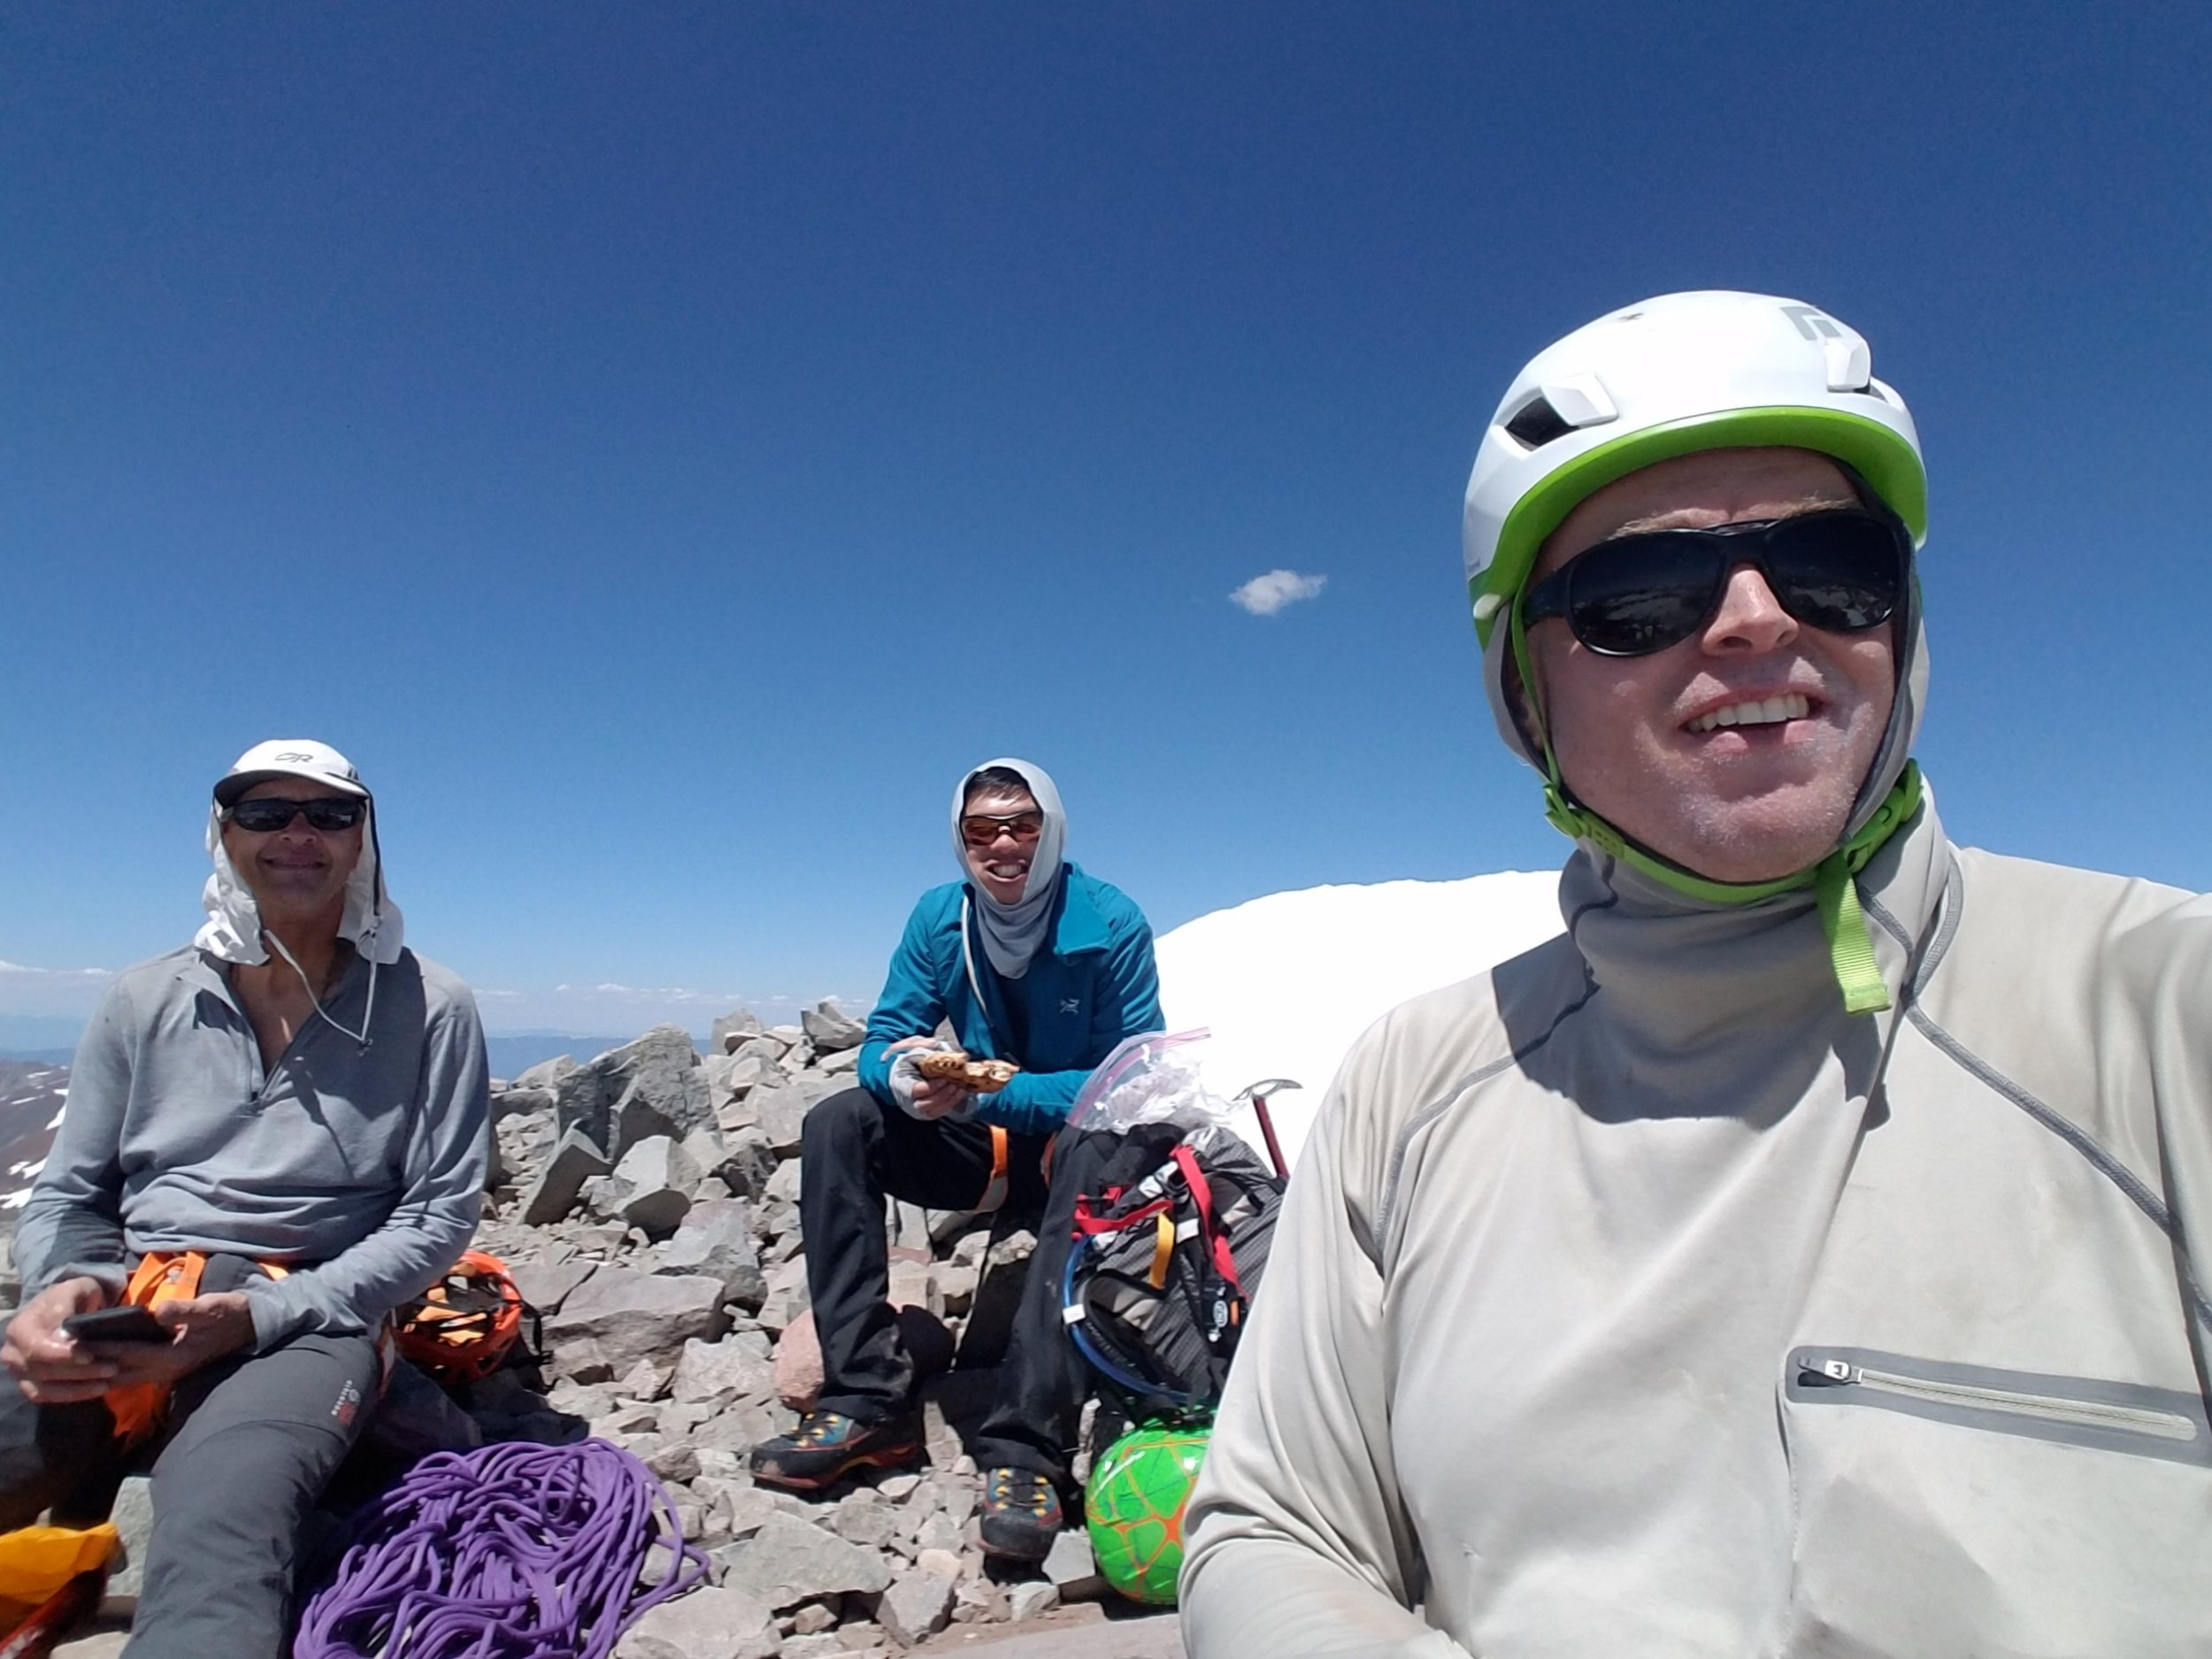 Glory in the summit selfie.